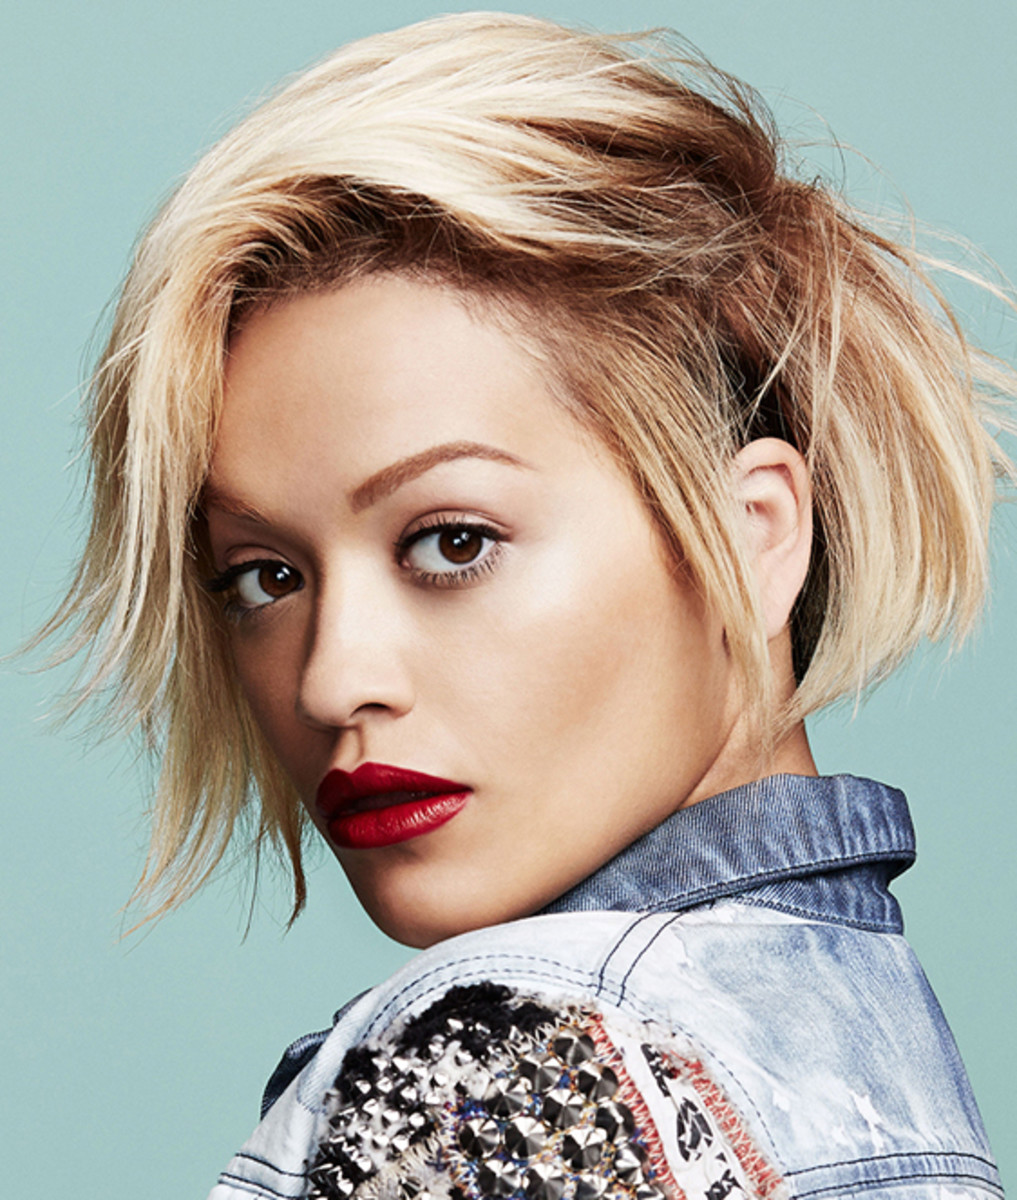 Rimmel London Fall 2014_singer songwriter Rita Ora_Flare Magazine